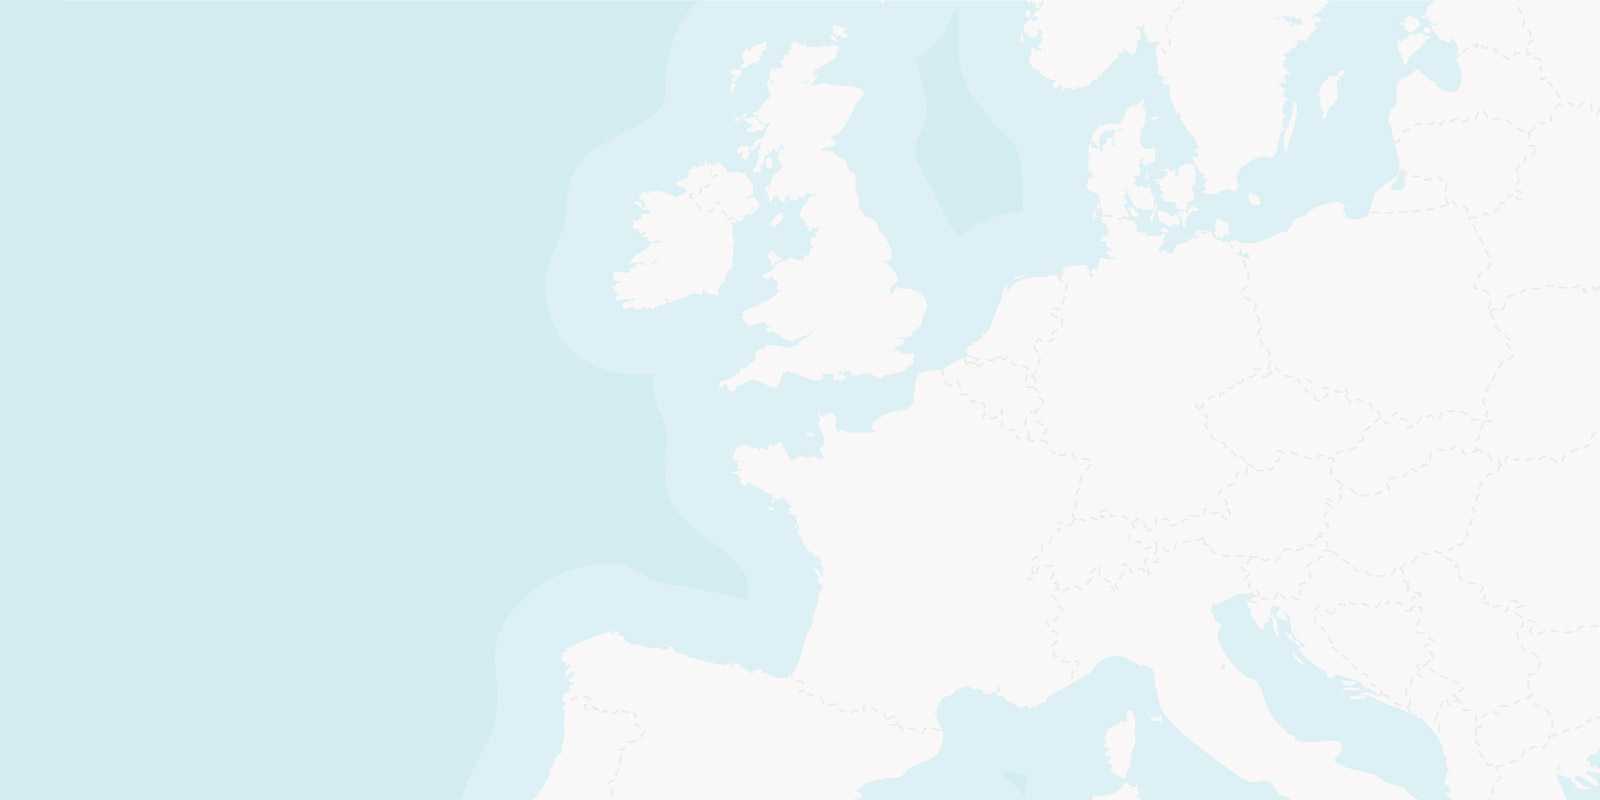 Hotmaps map